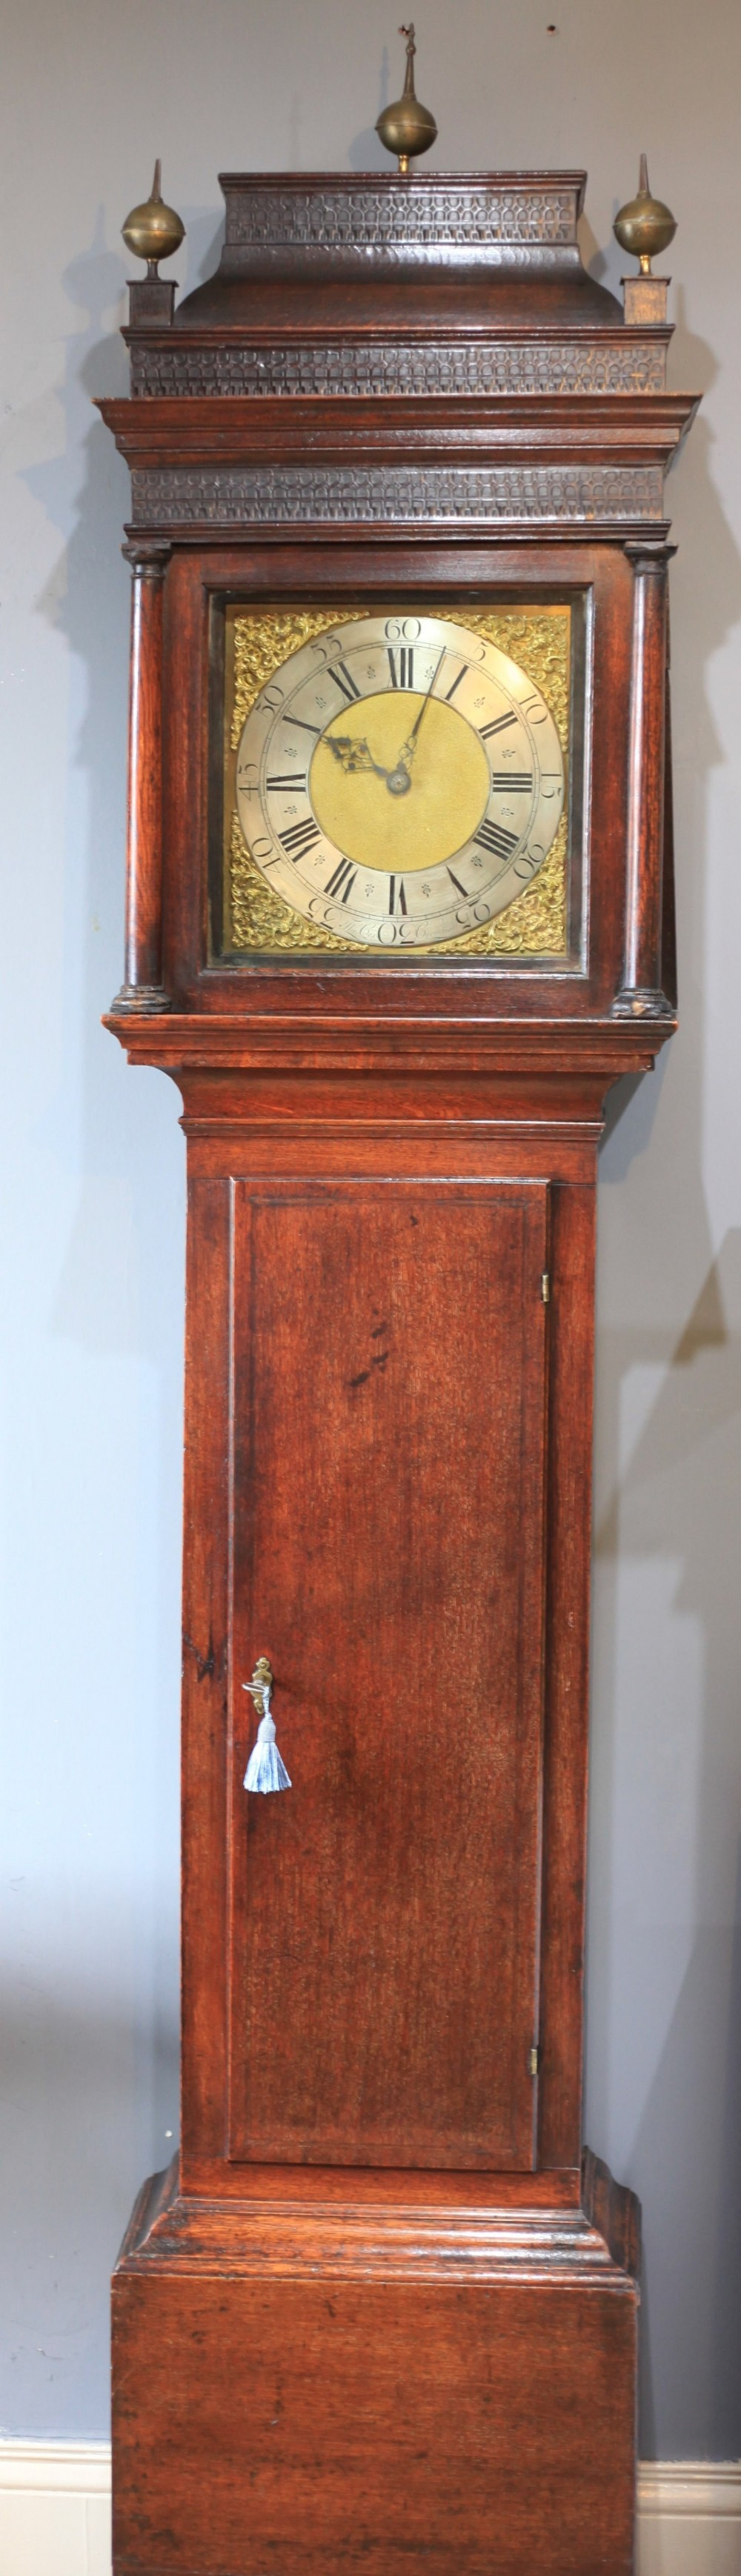 a george i 30 hour oak longcase clock by thomas cox c1740